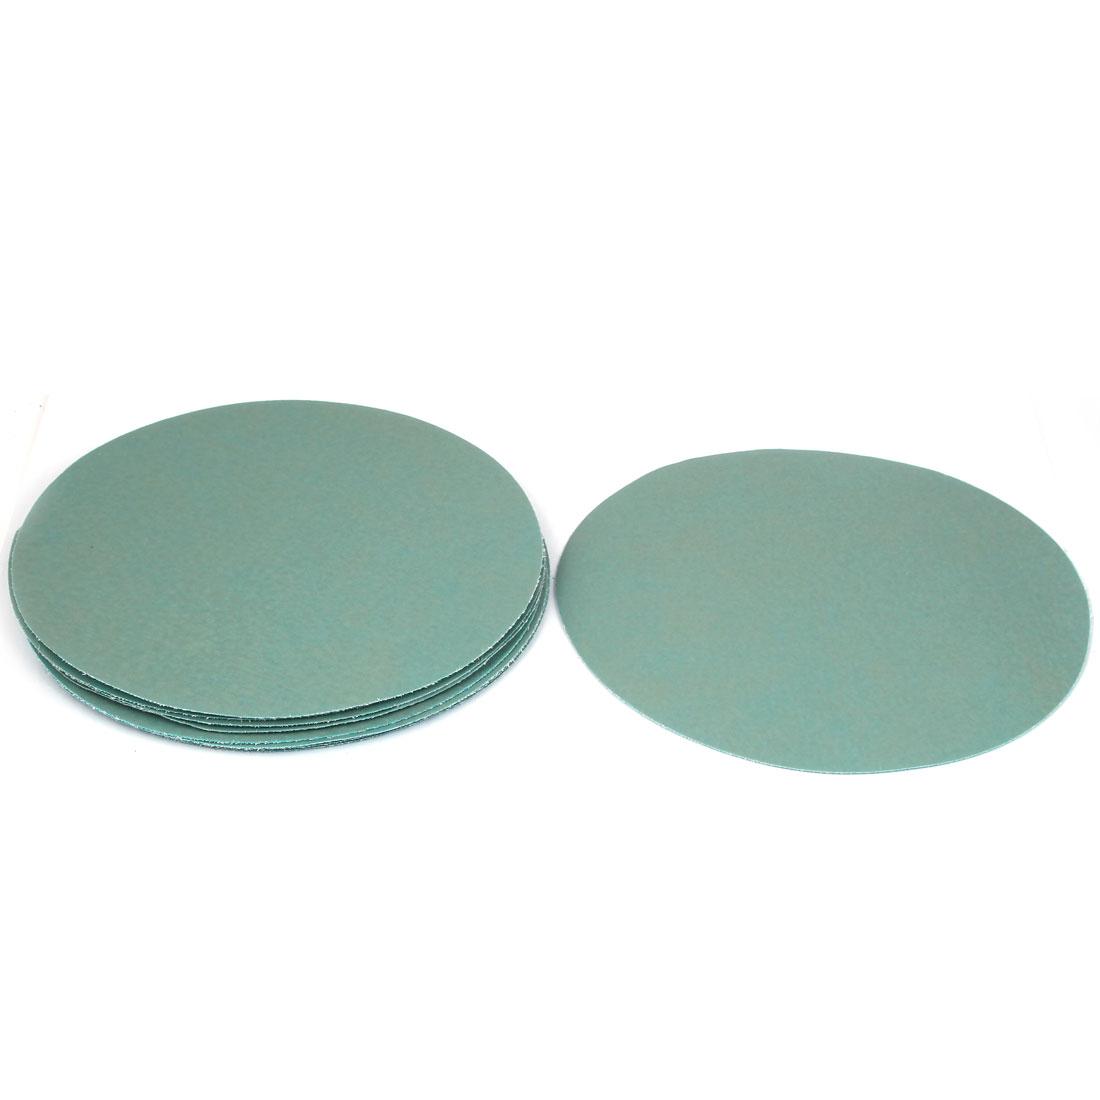 "8"" Dia Wet Dry Silicone Carbide 7000 Grit Polishing Sand Paper 10pcs"